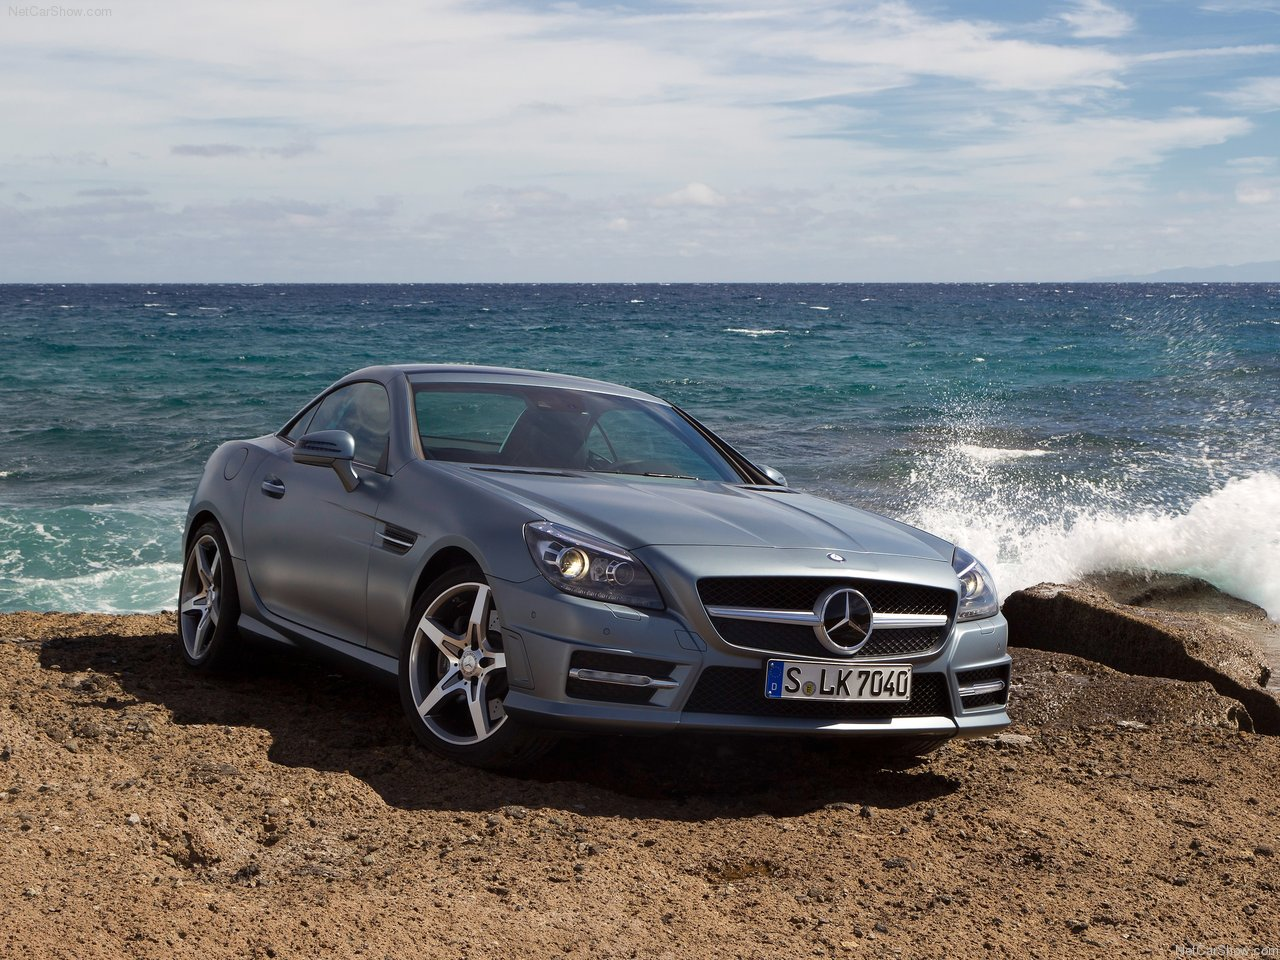 http://3.bp.blogspot.com/-yd9q1qi5JHI/TZxhoAEw3II/AAAAAAACMd4/GezQ9dSWxew/s1600/Mercedes-Benz-SLK350_2012_1280x960_wallpaper_04.jpg